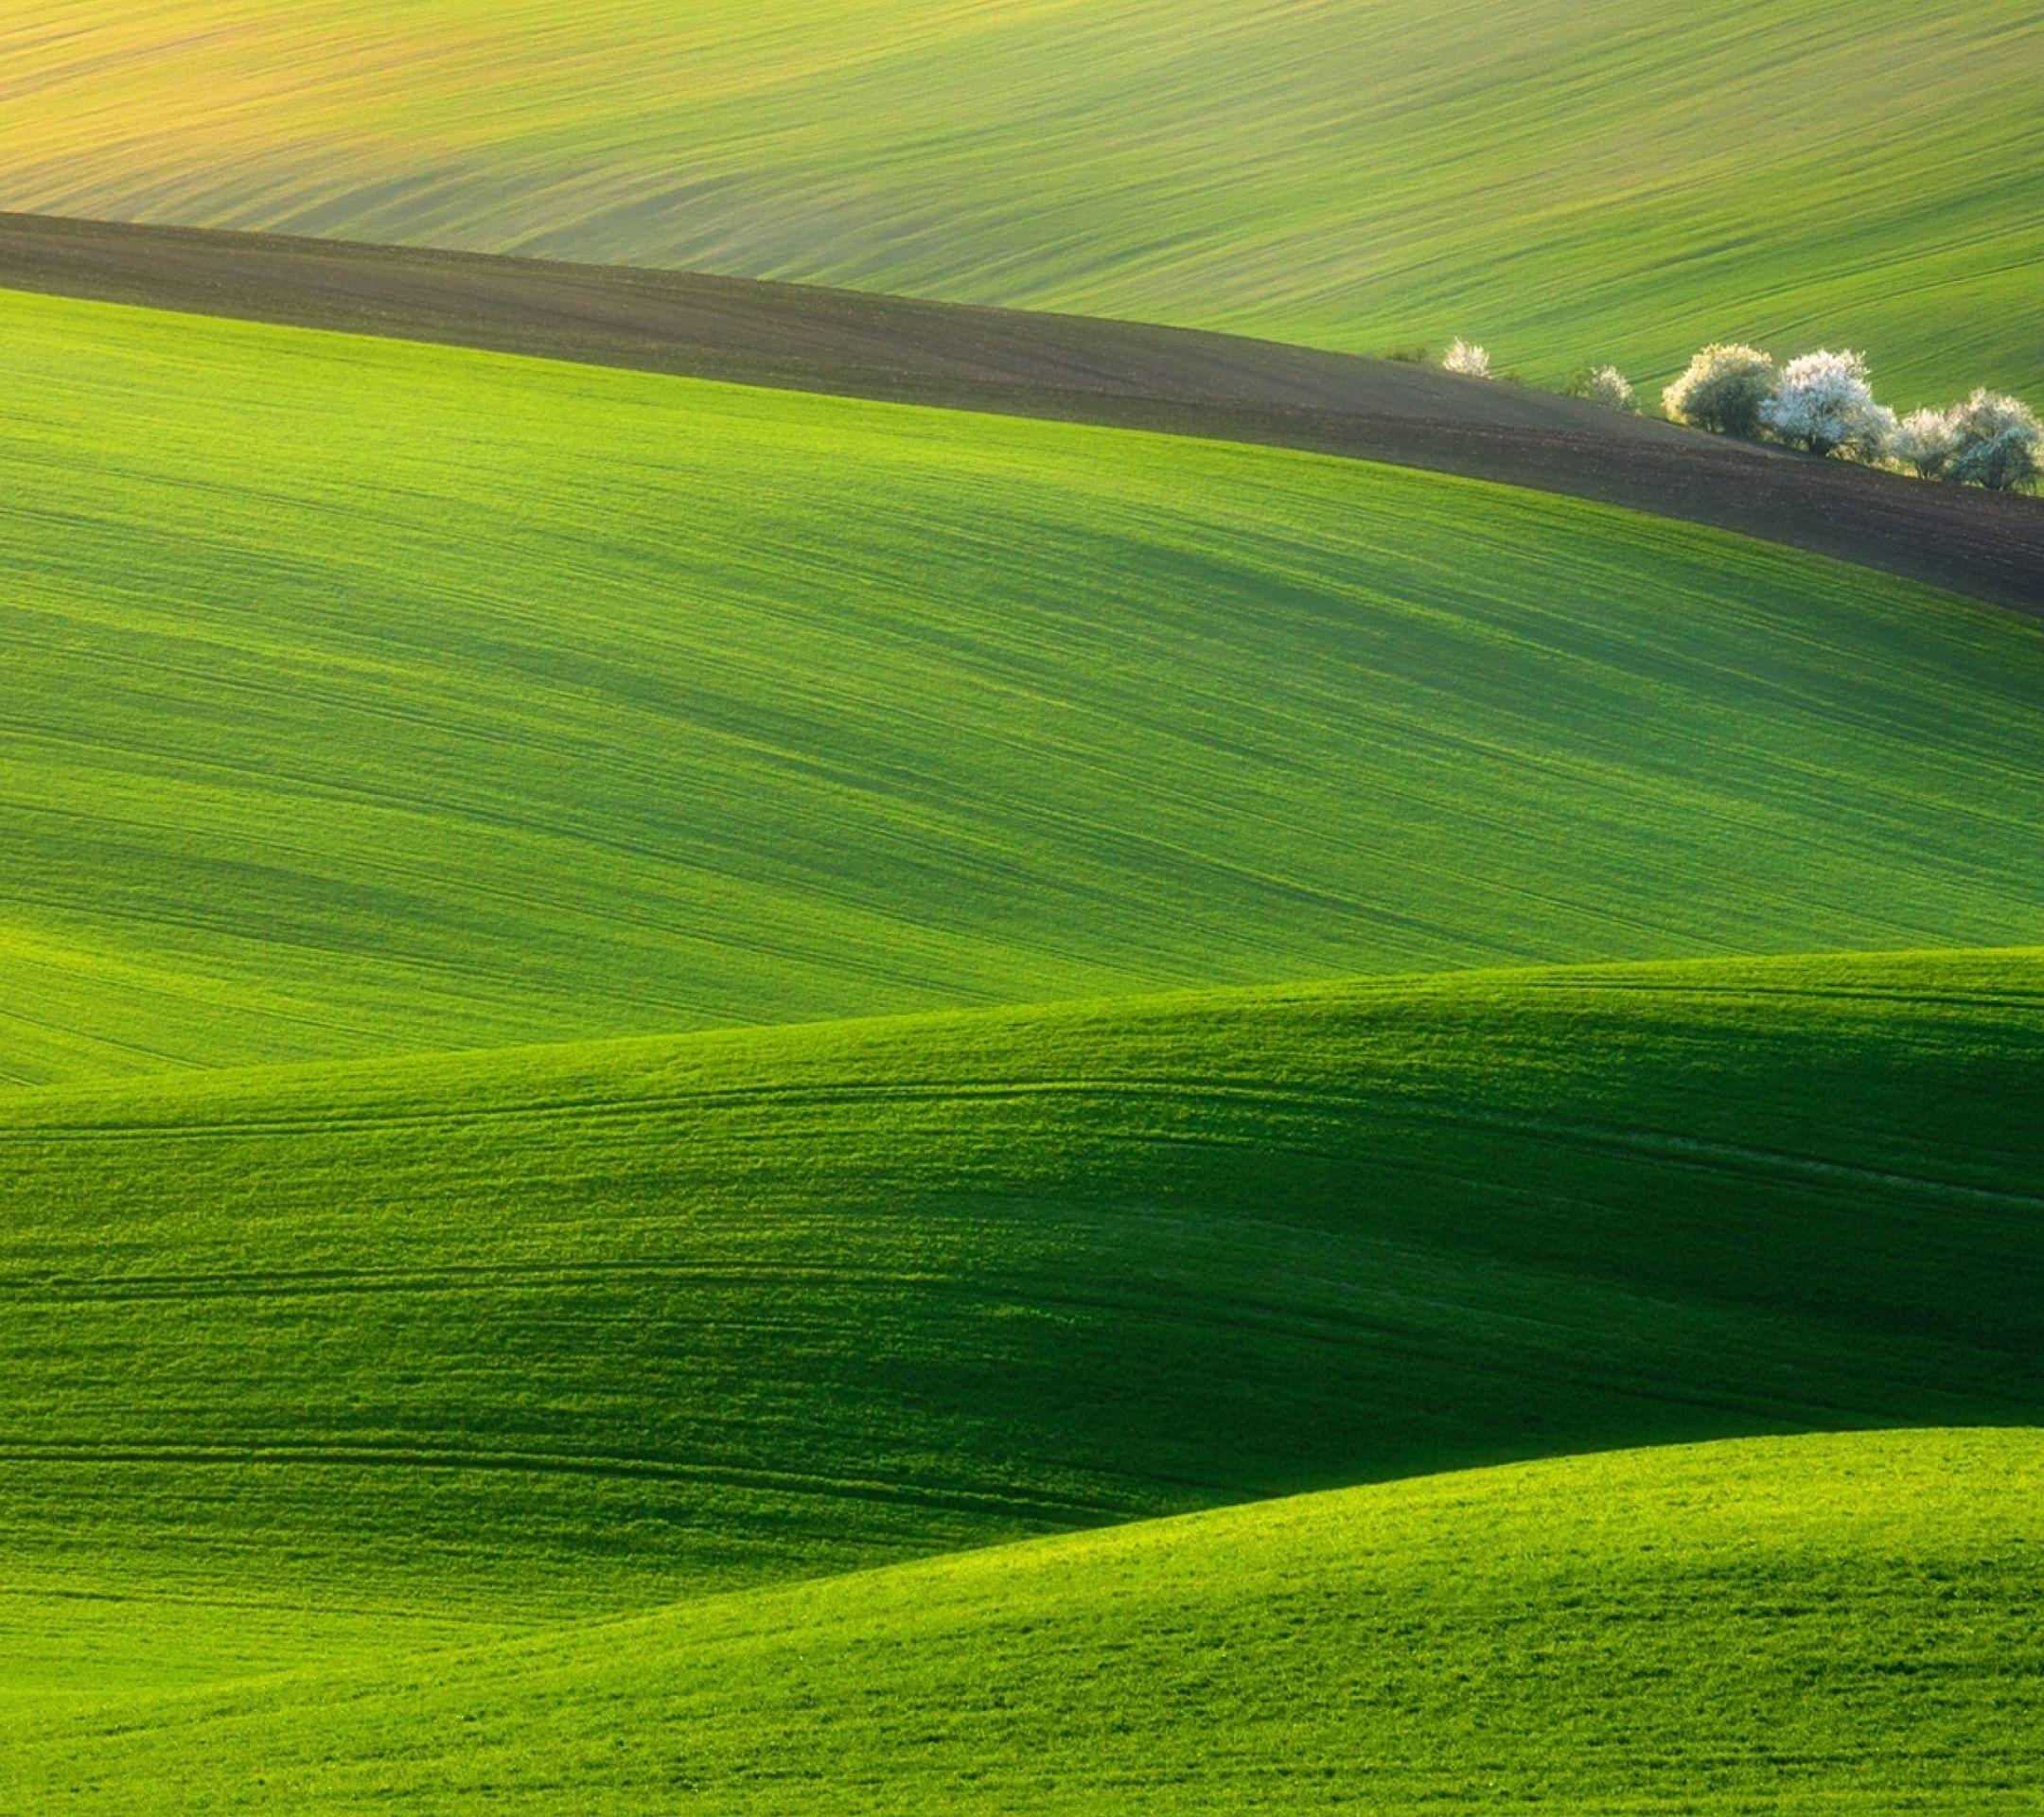 Green Field - Tap to see more #beautiful #field #scenery wallpapers - @mobile9 | Scenery wallpaper, Scenery, Field